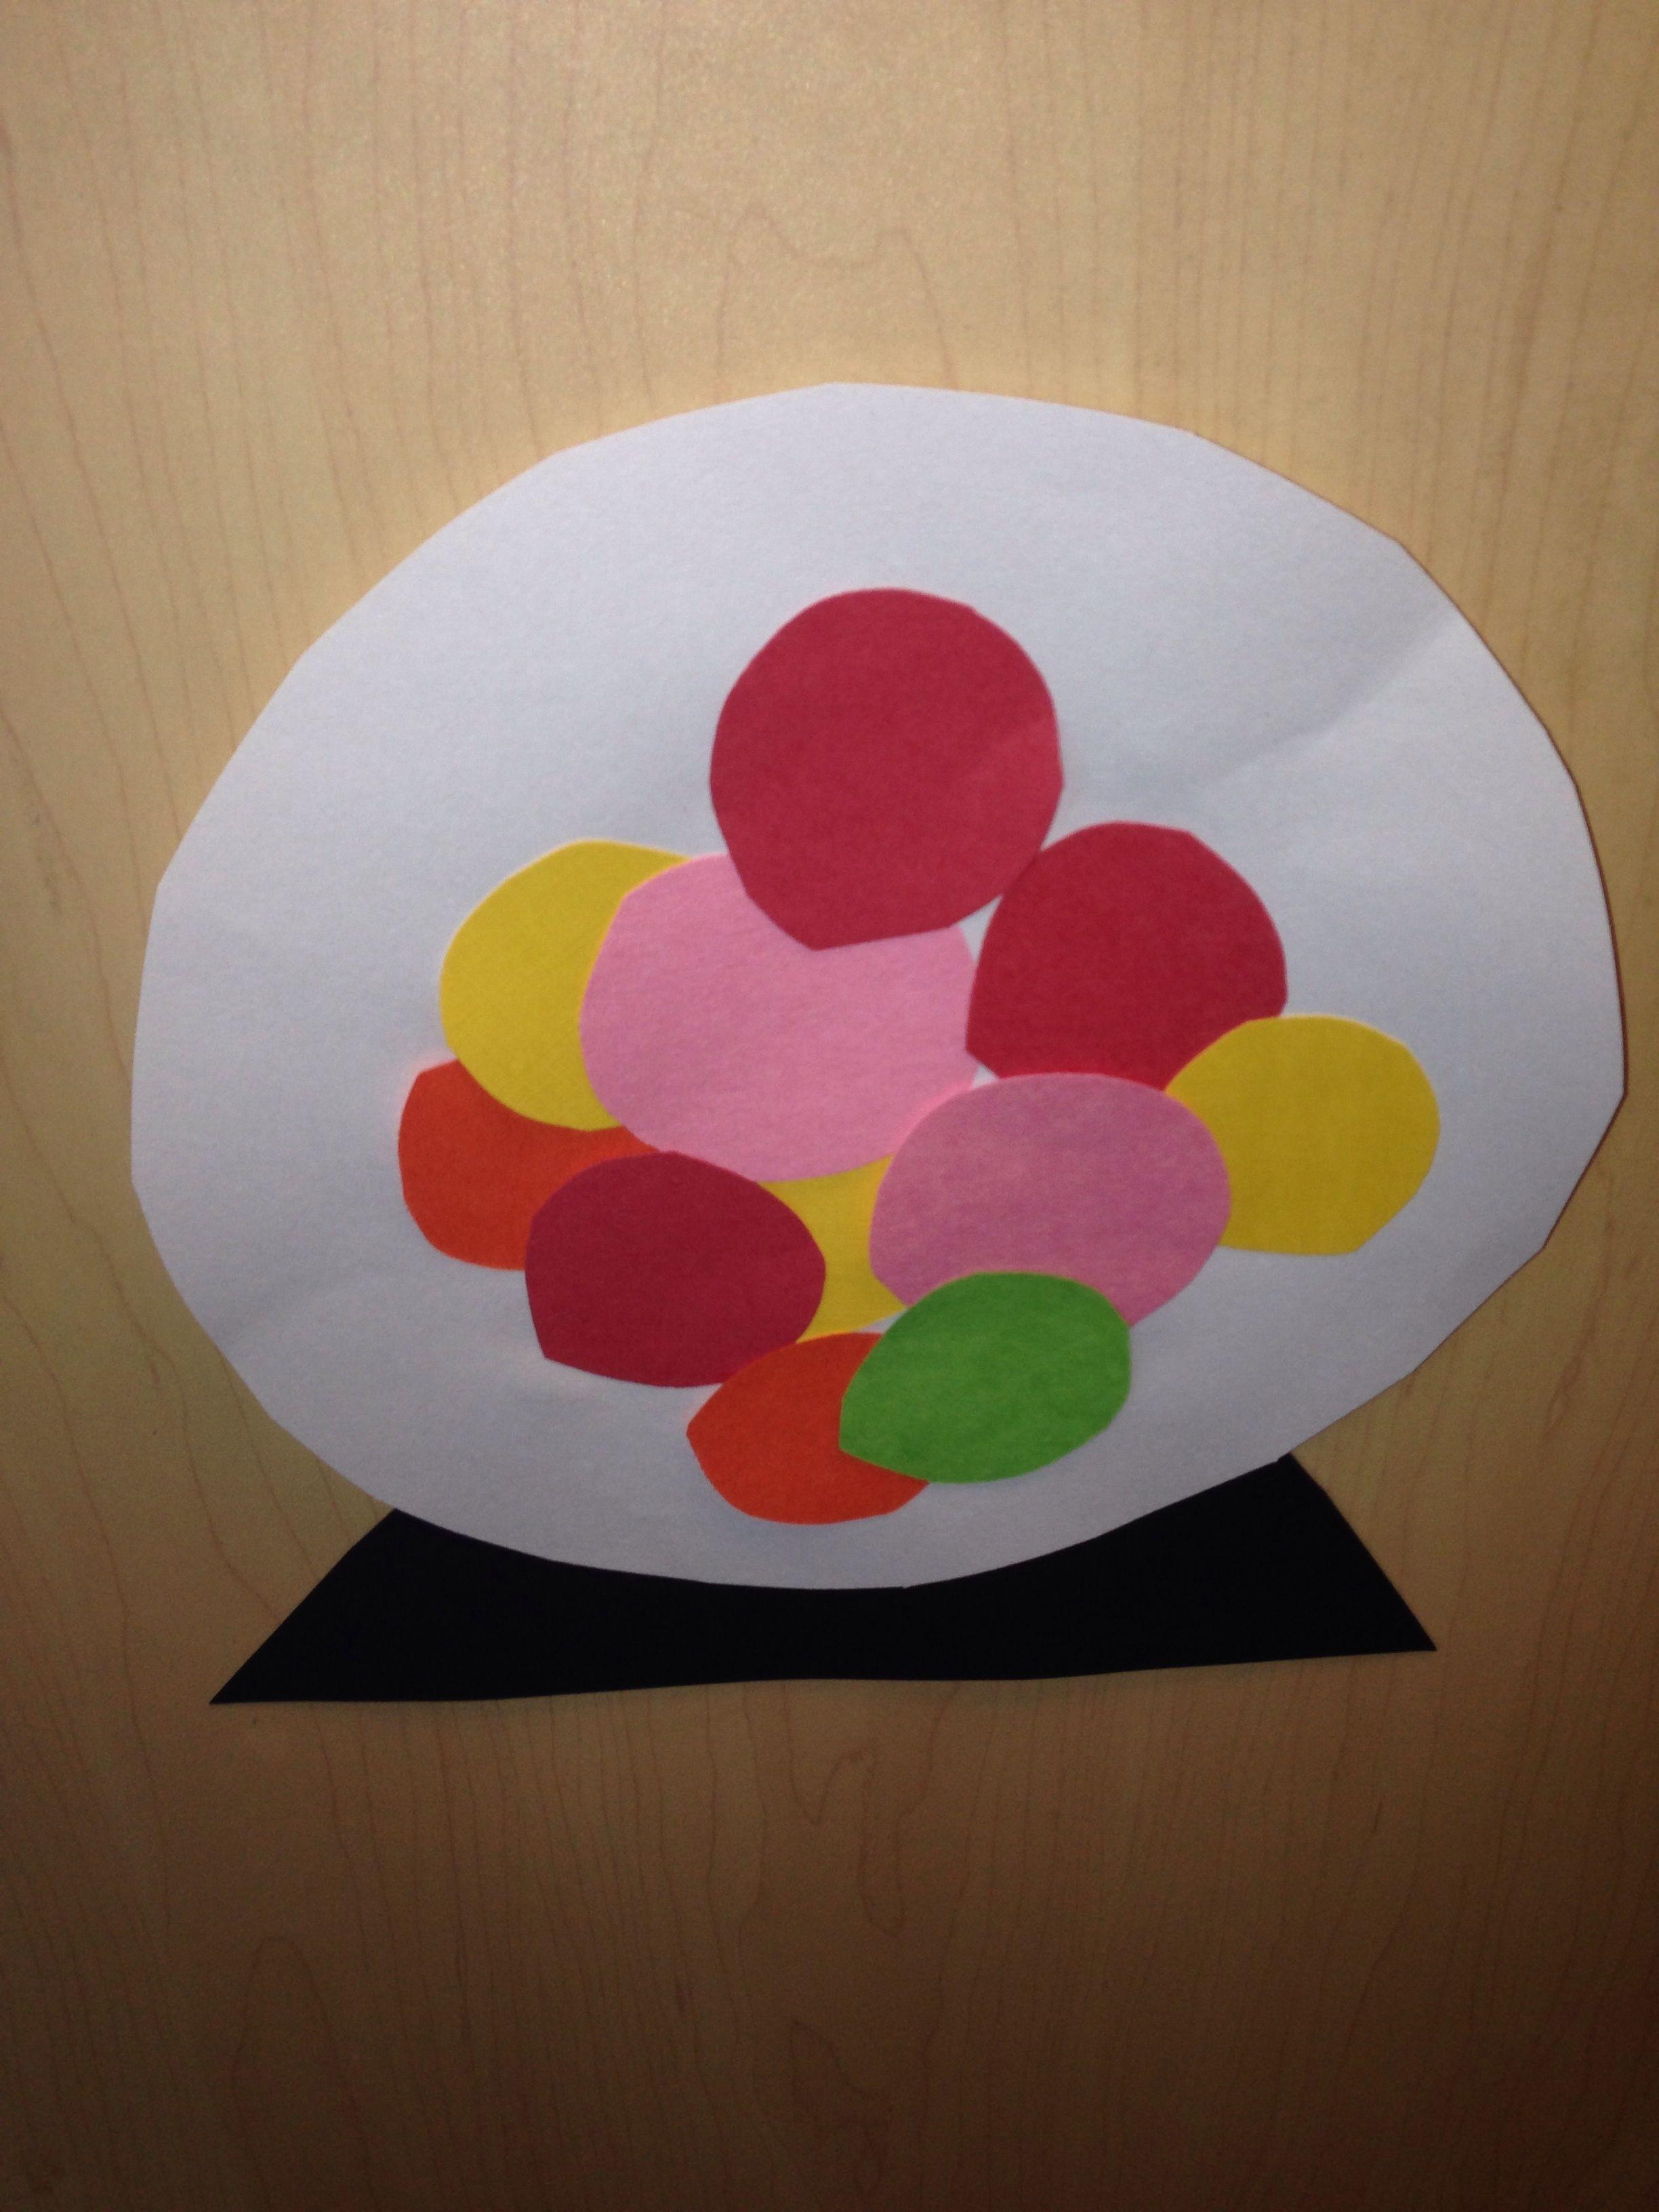 Gum Ball Machine Preschool